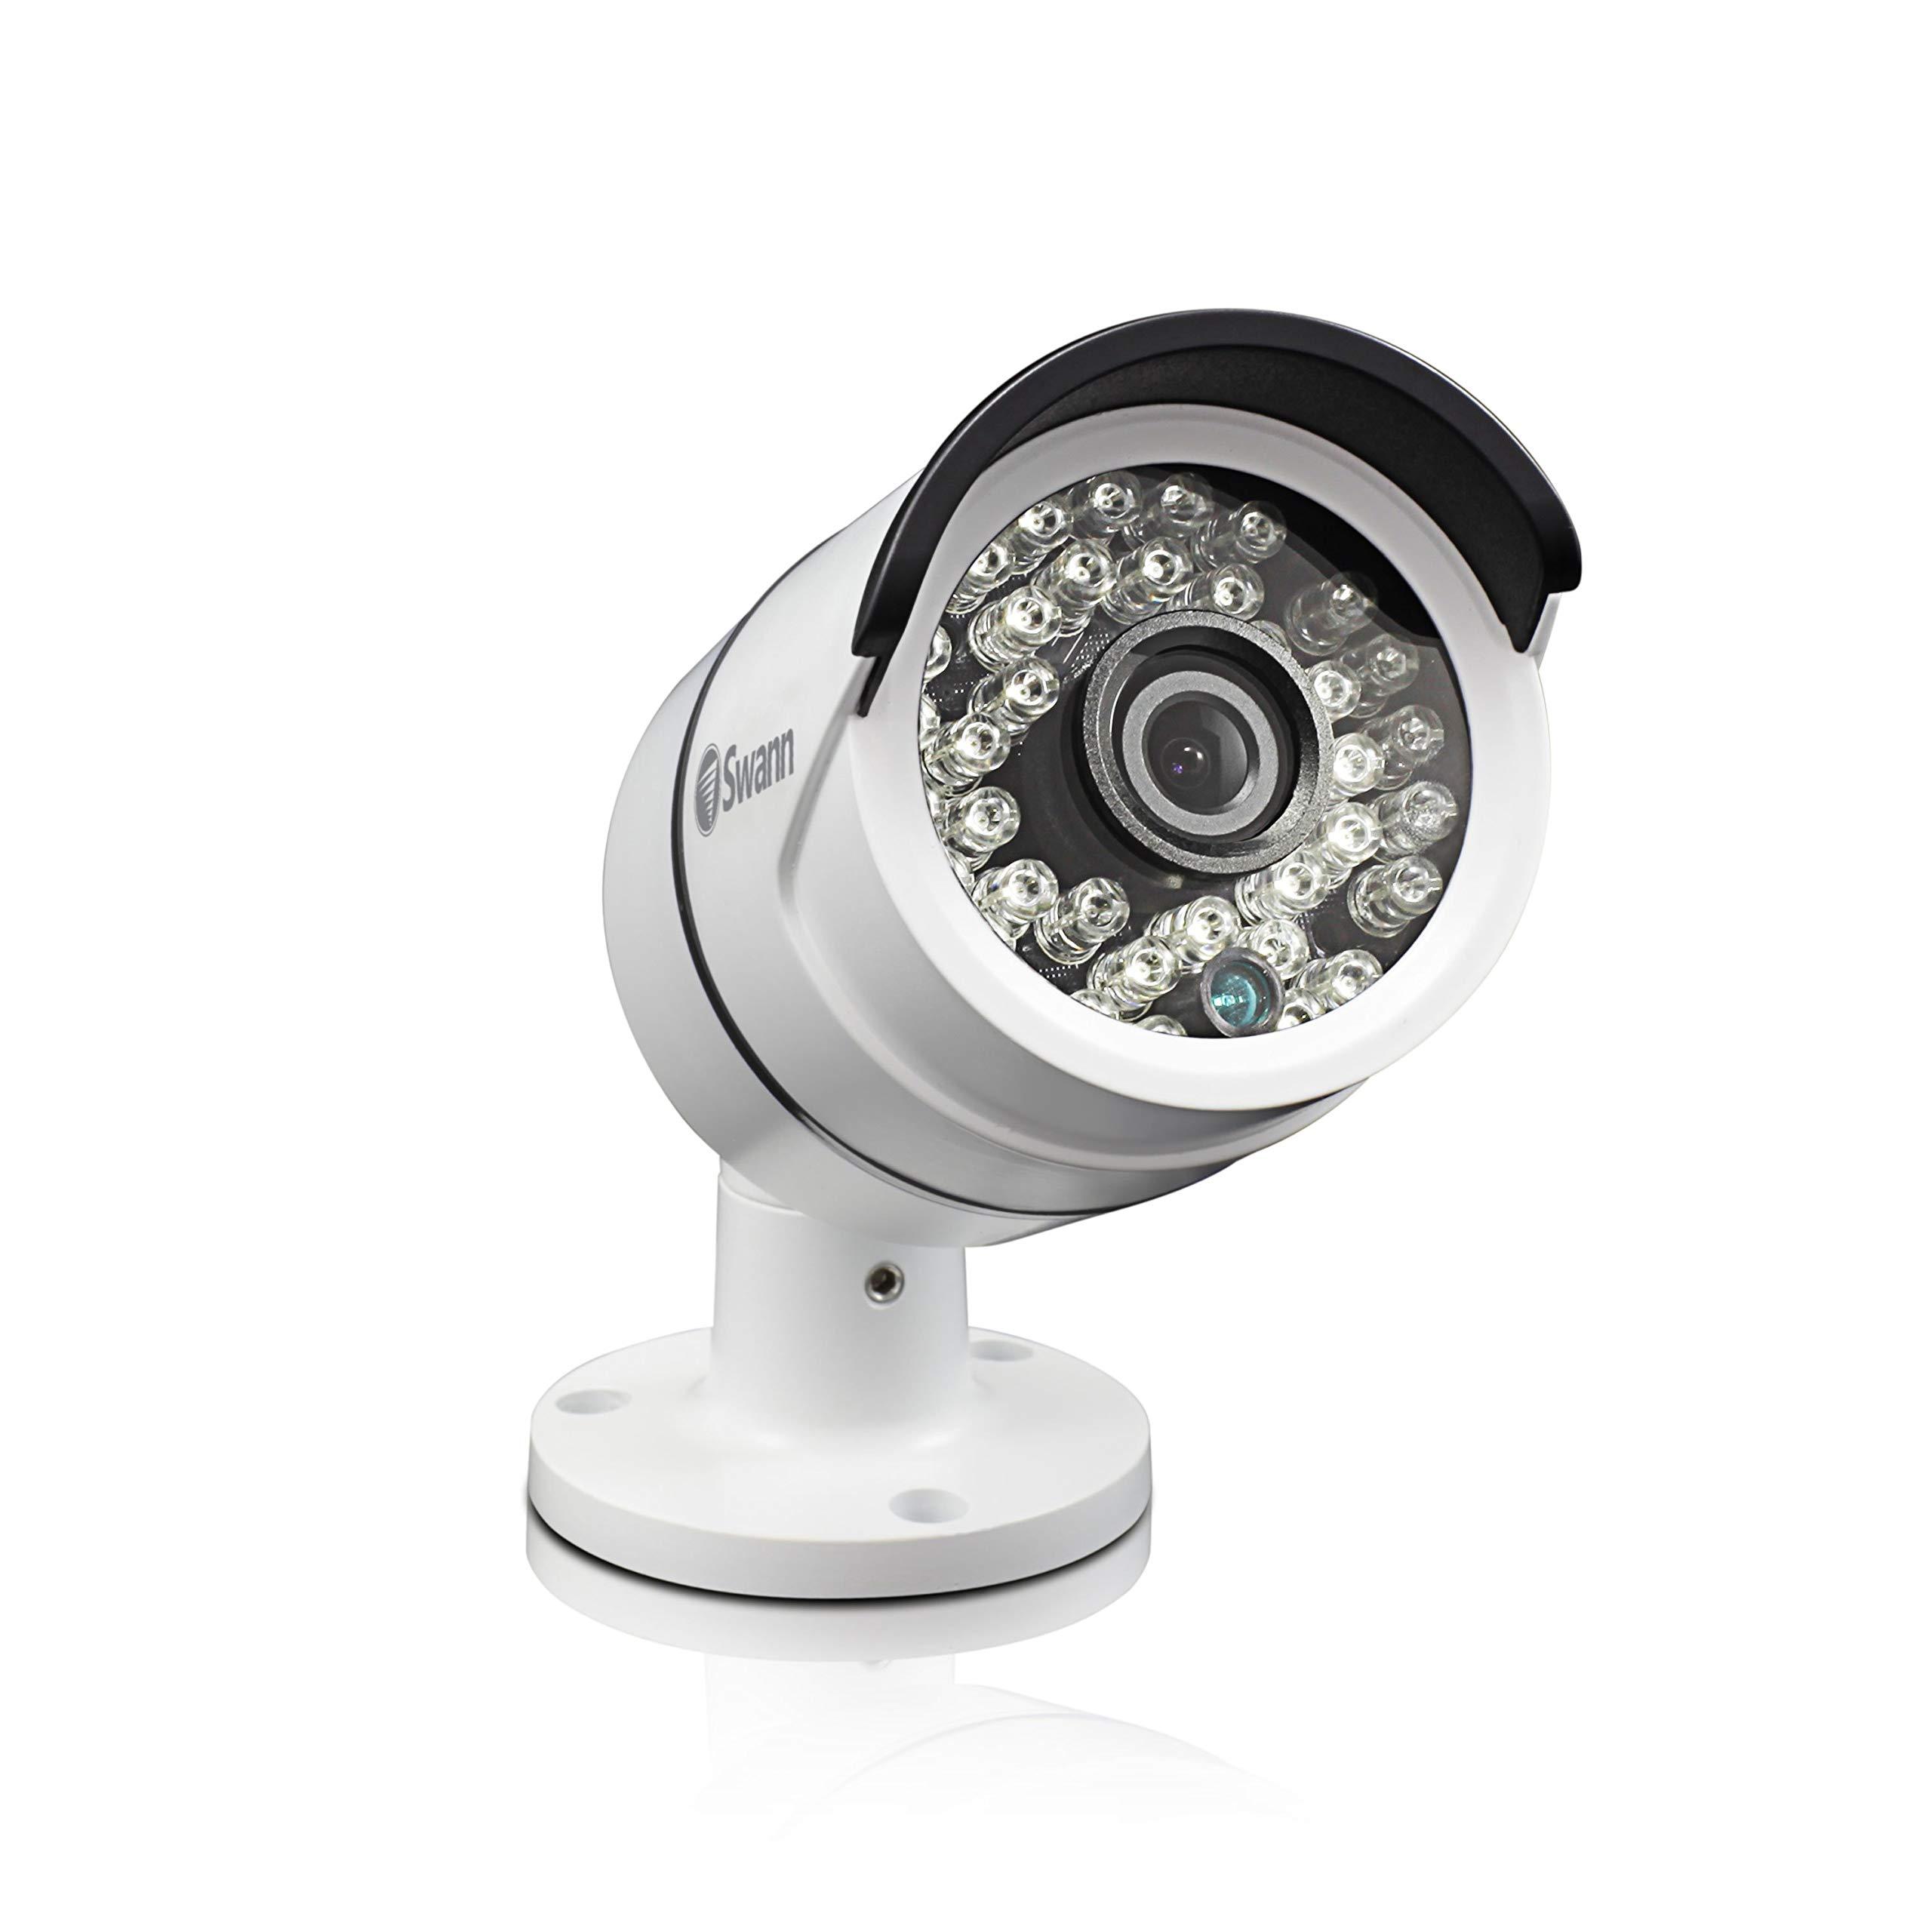 SWANN Cameras Surveillance System, White (SWPRO-T858CAM-US) by Swann